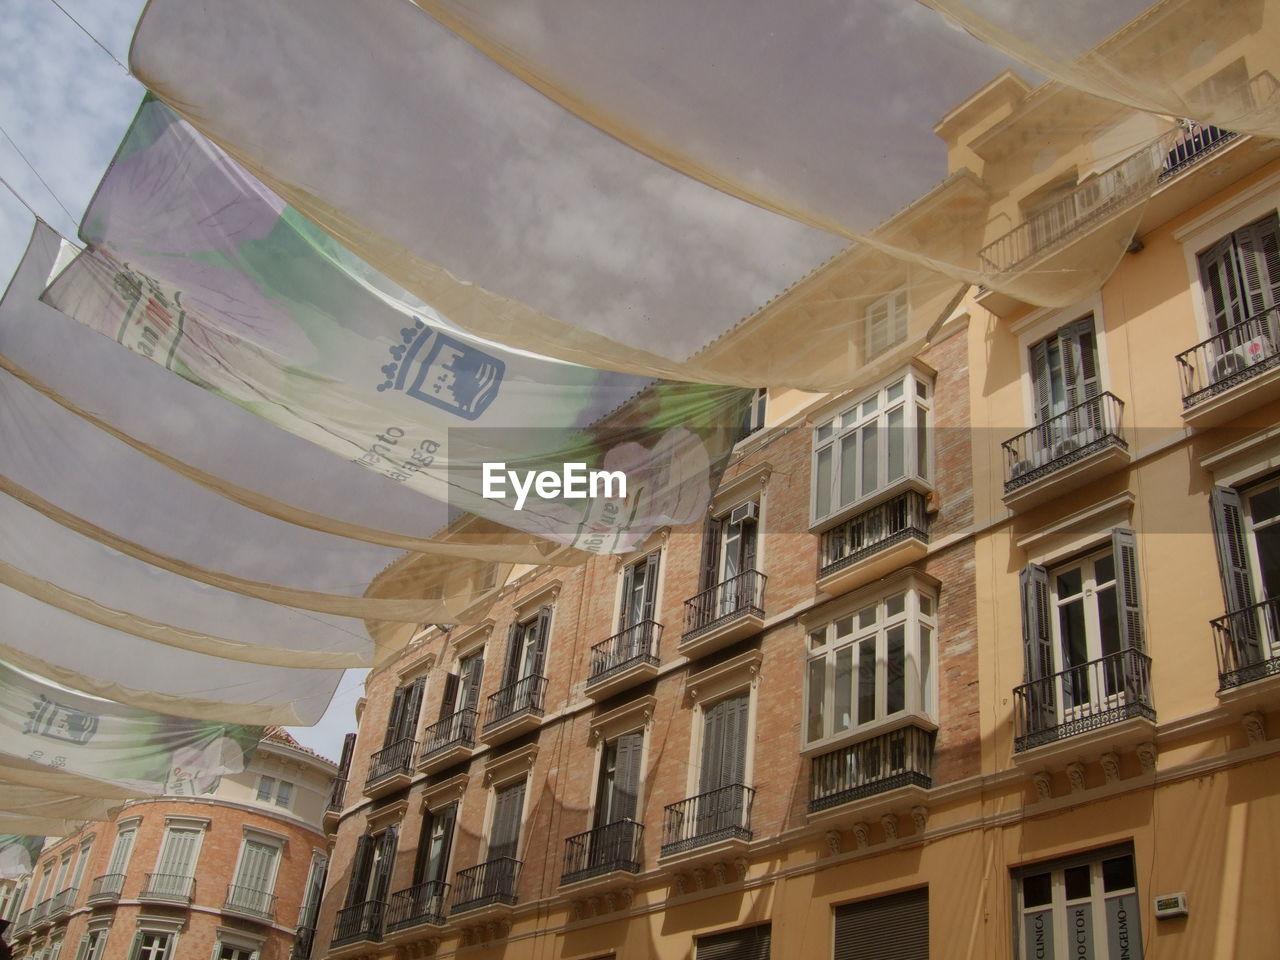 Fabrics against residential buildings